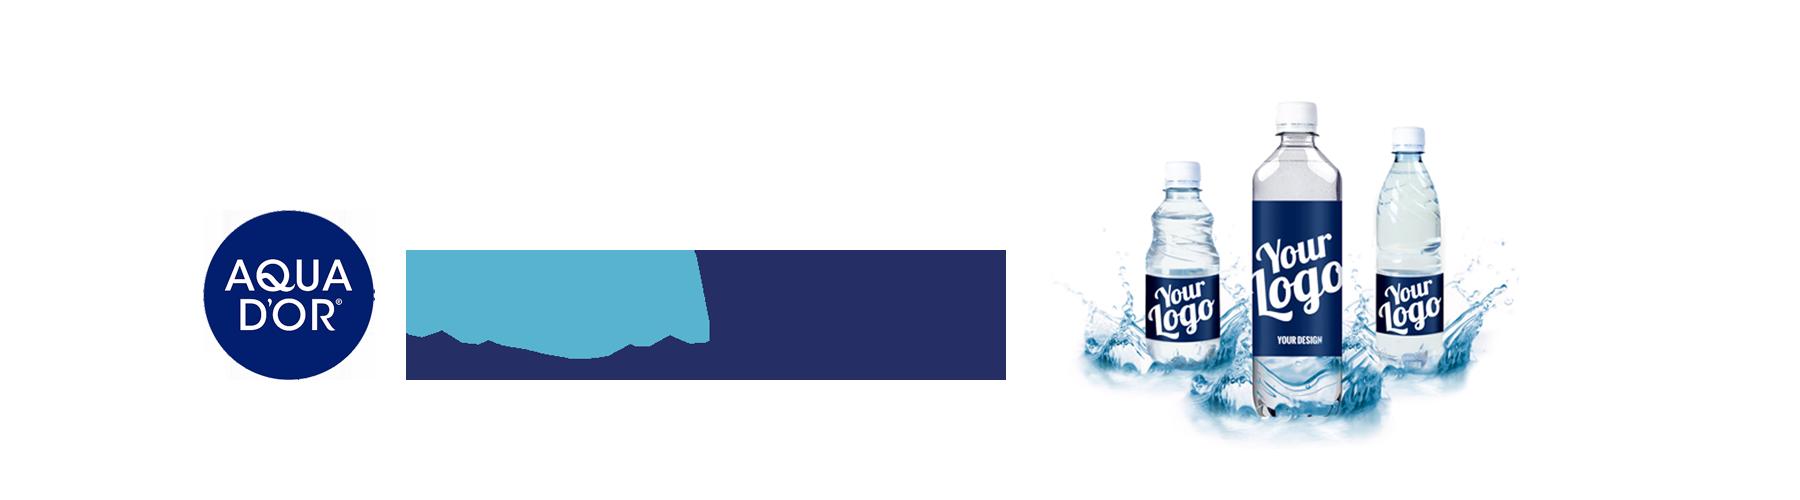 AQUADANA